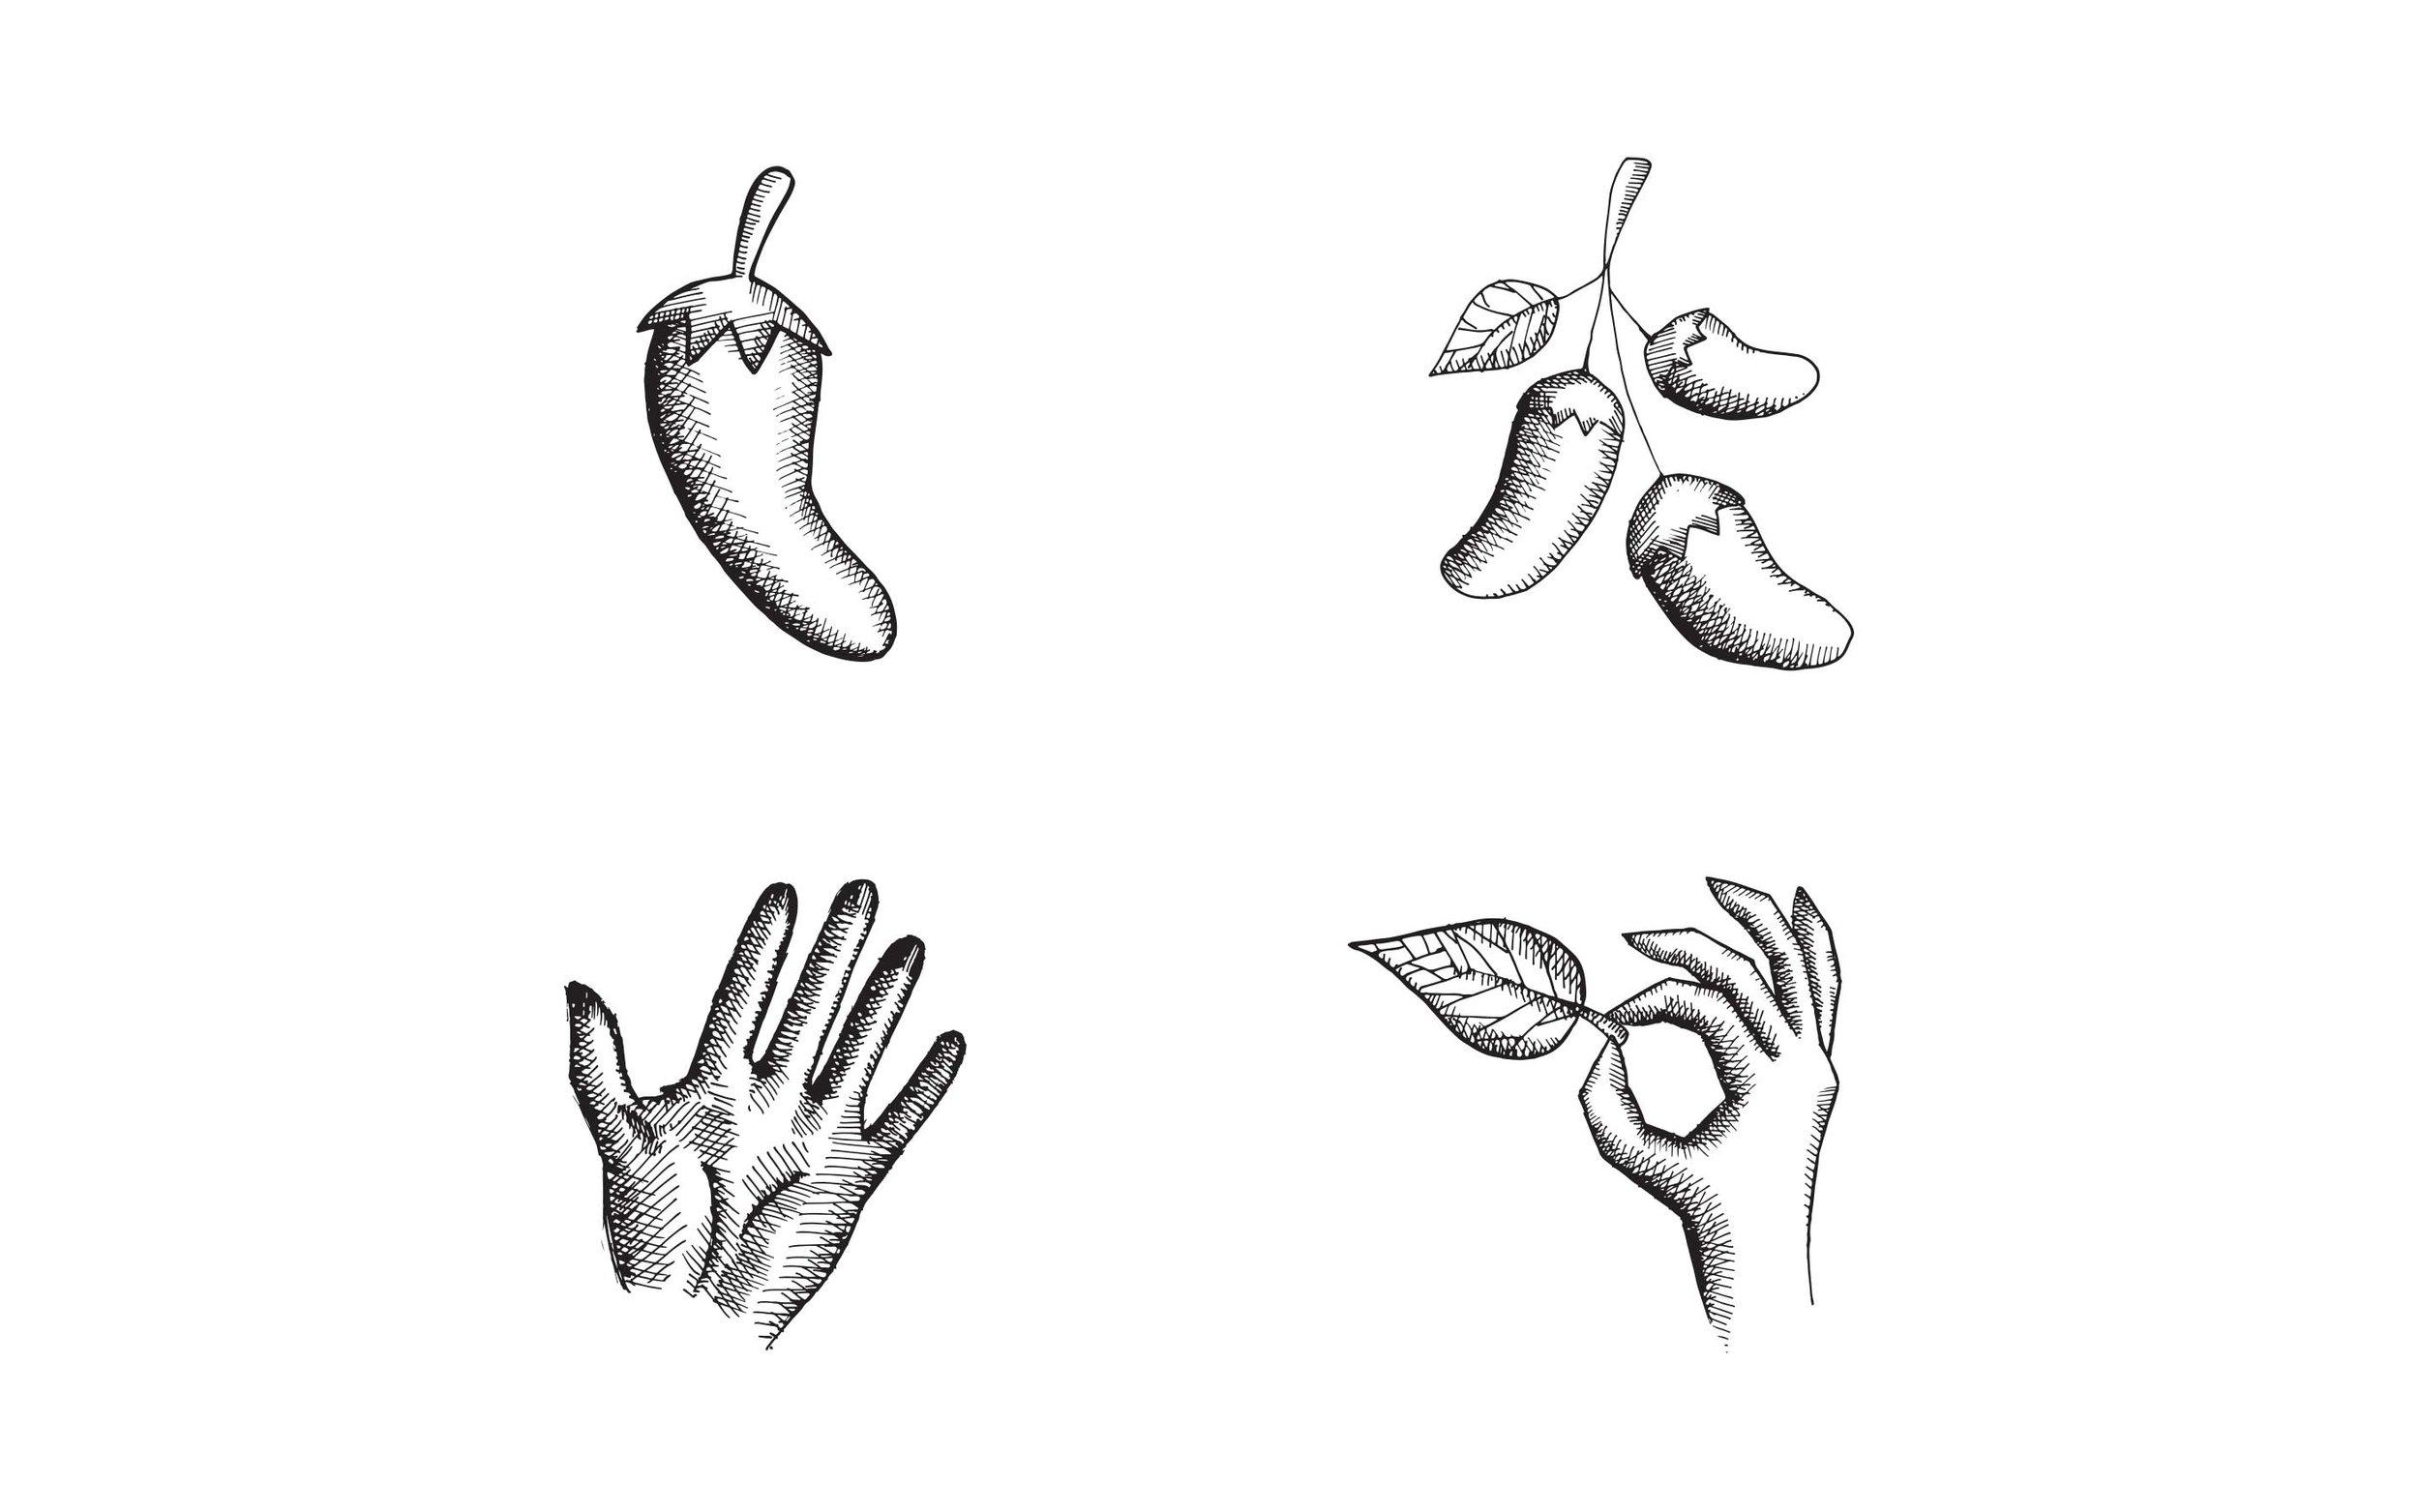 bravado-spice_illustration-1.jpg